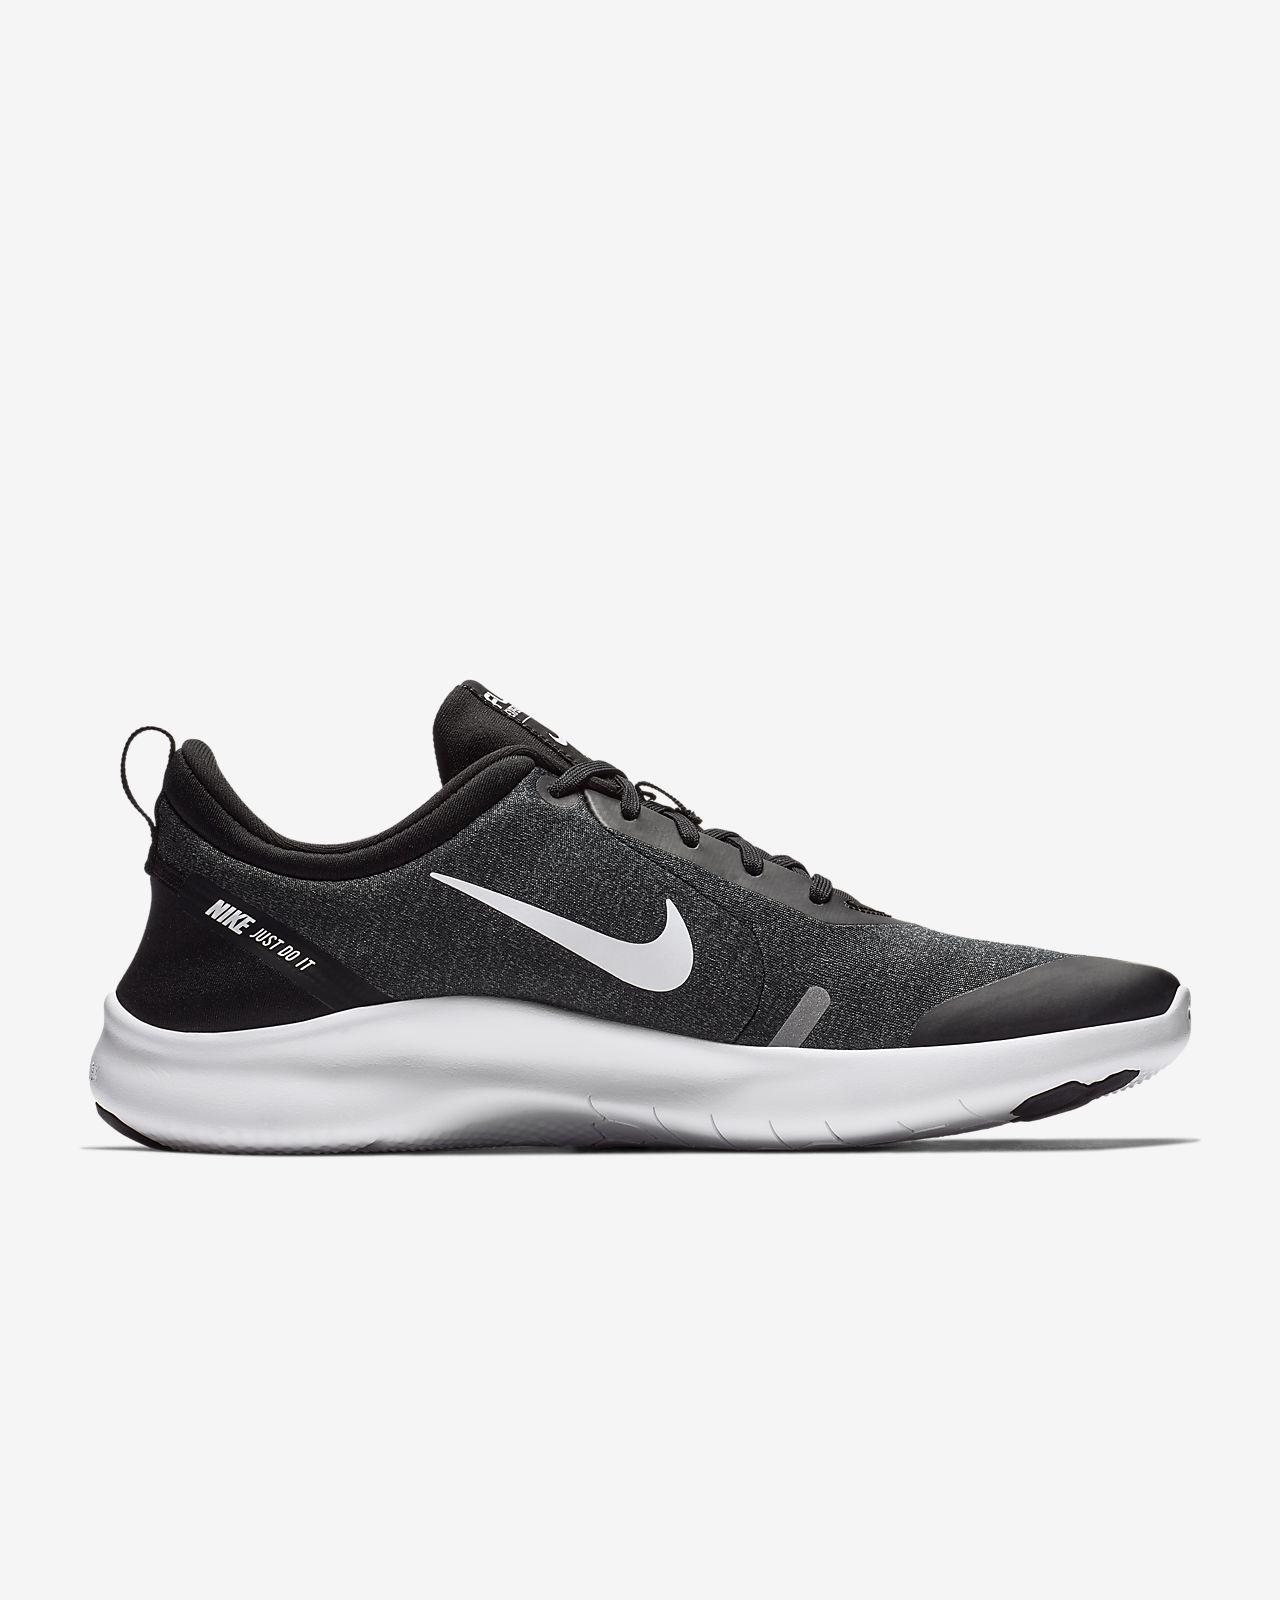 Chaussure de running Nike Flex Experience RN 8 pour Homme